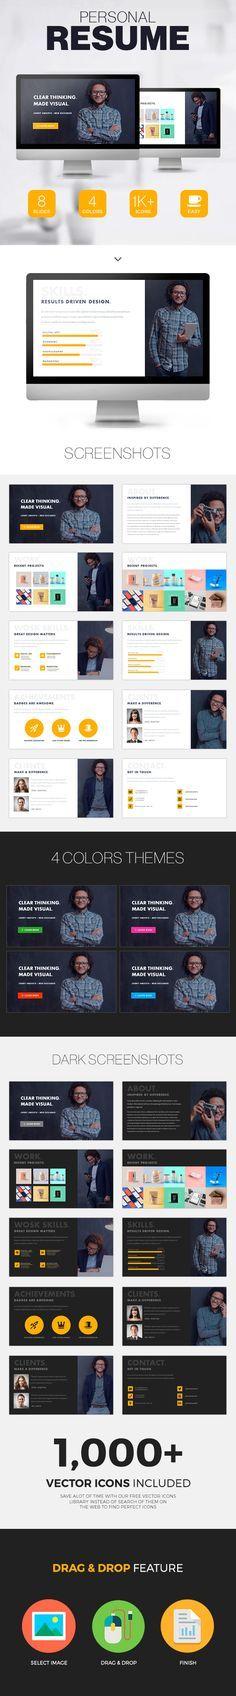 DigiTech Multipurpose Google Slide Template - resume presentation